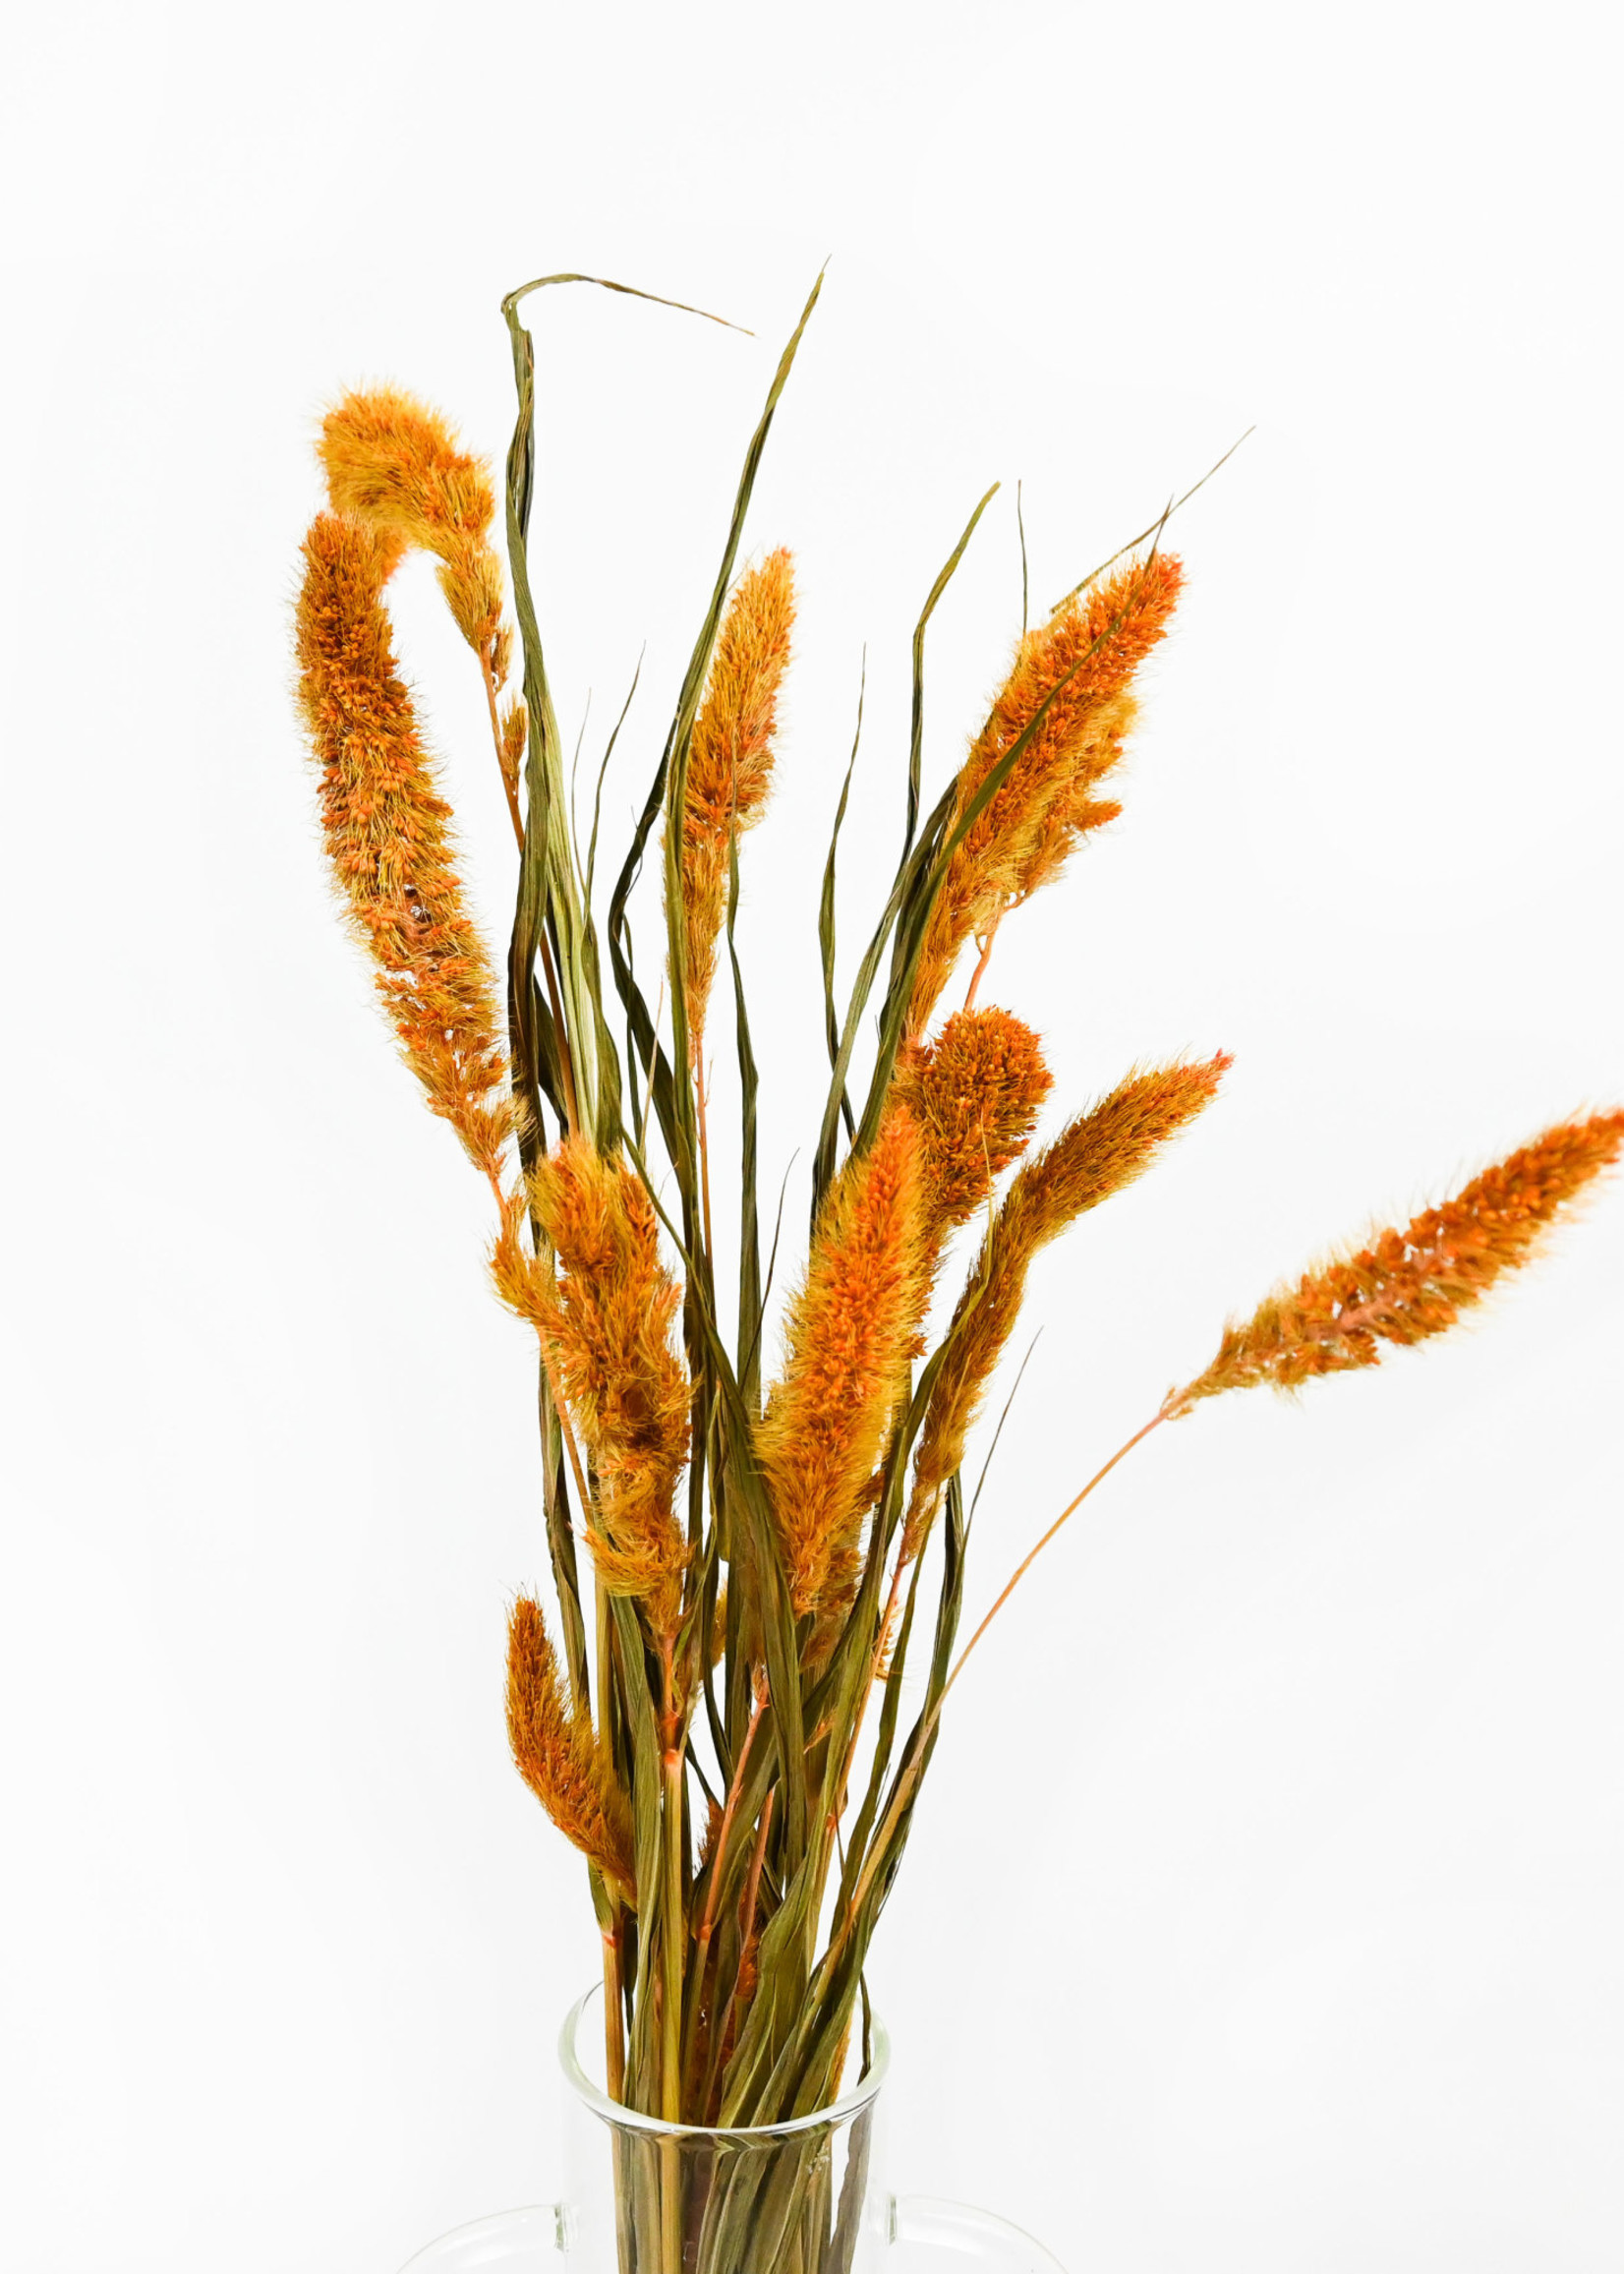 Dry flower setaria